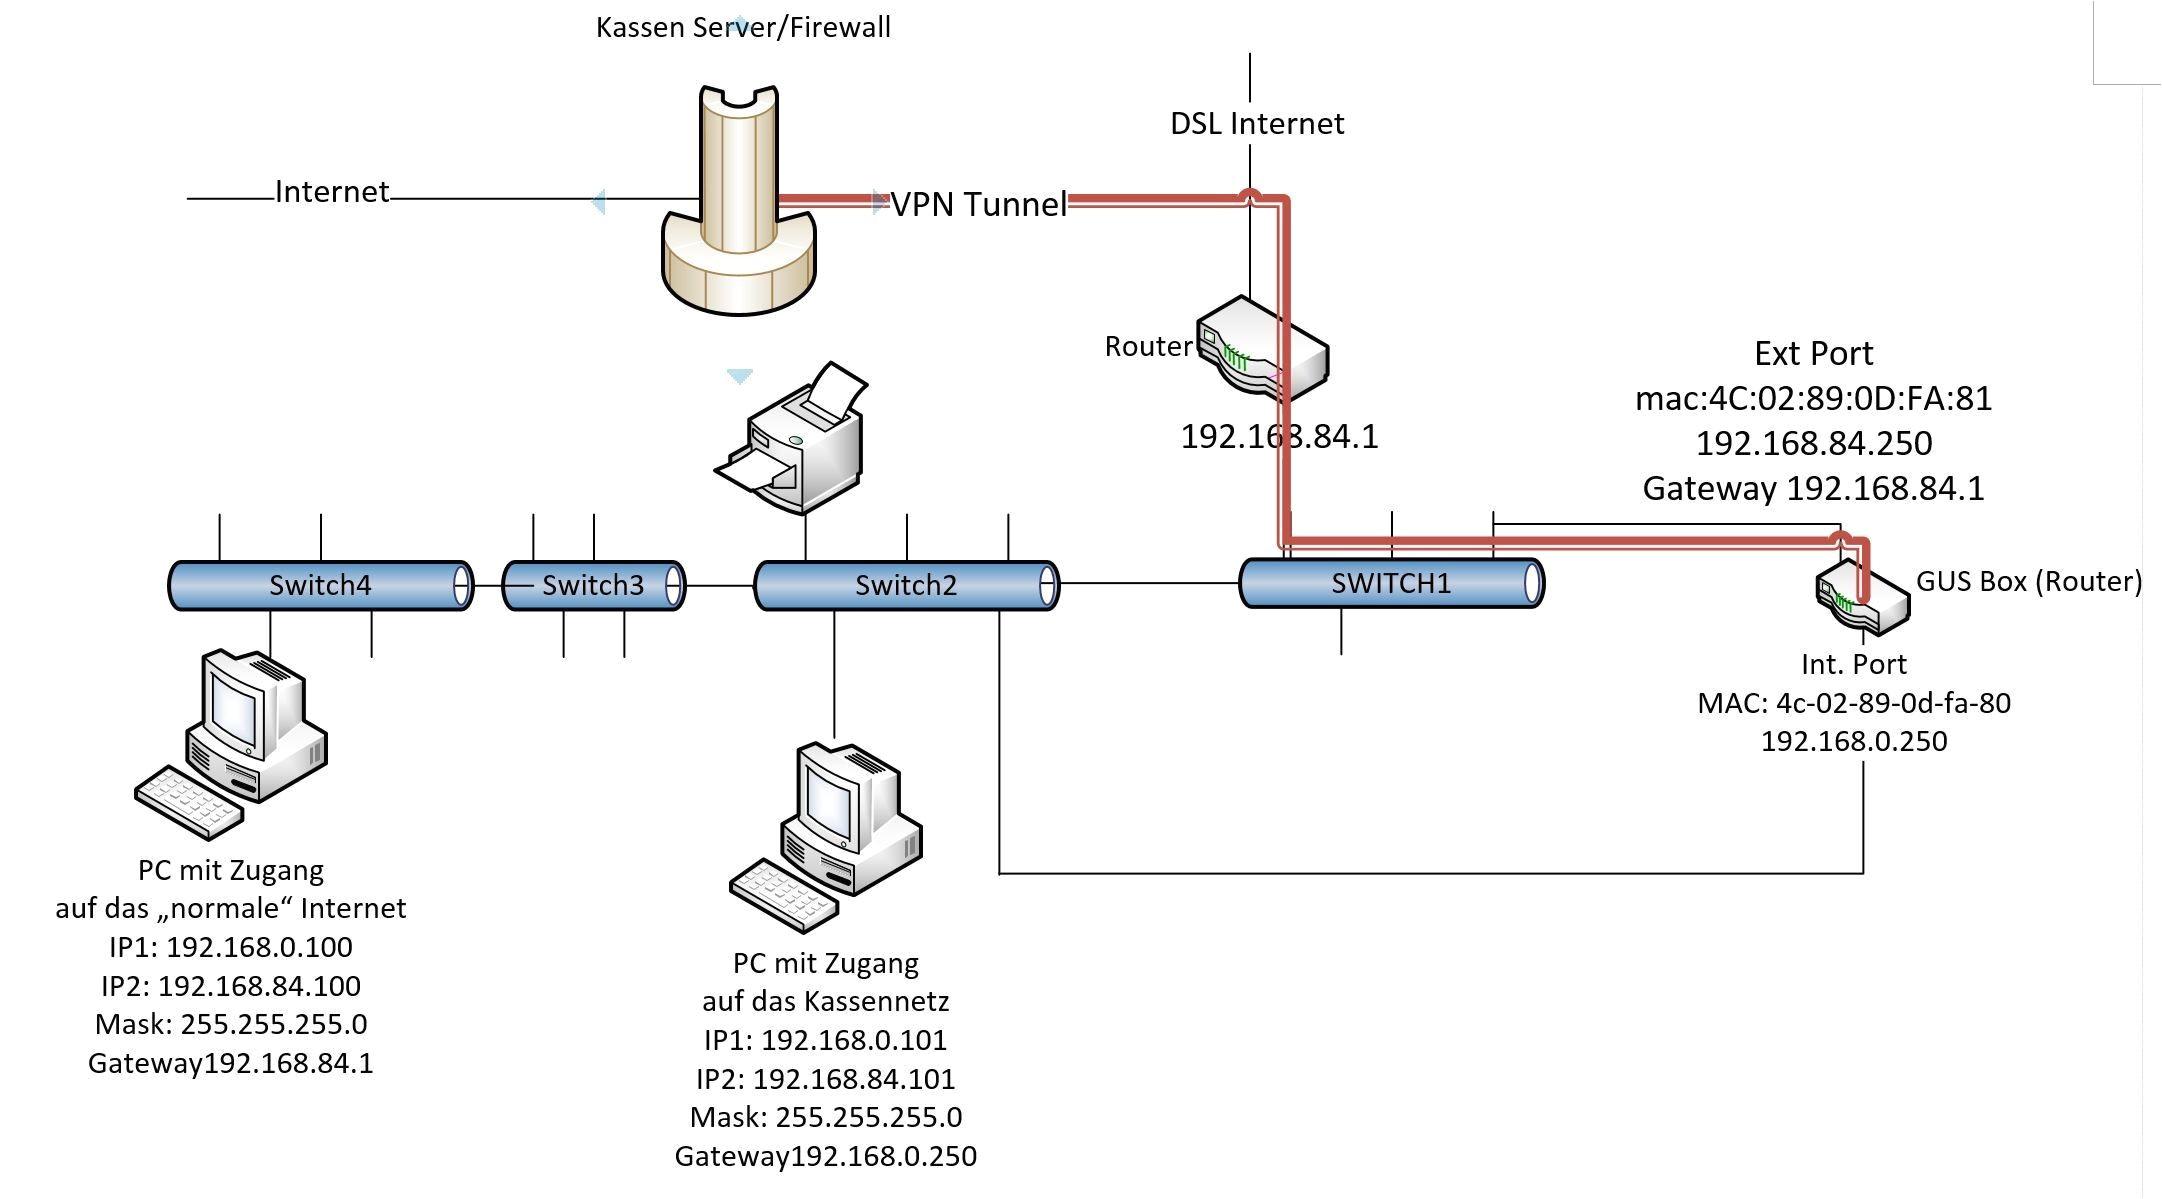 samick kr guitar wiring diagrams wiring diagram structureaxl bass wiring diagram wiring diagram technic samick kr